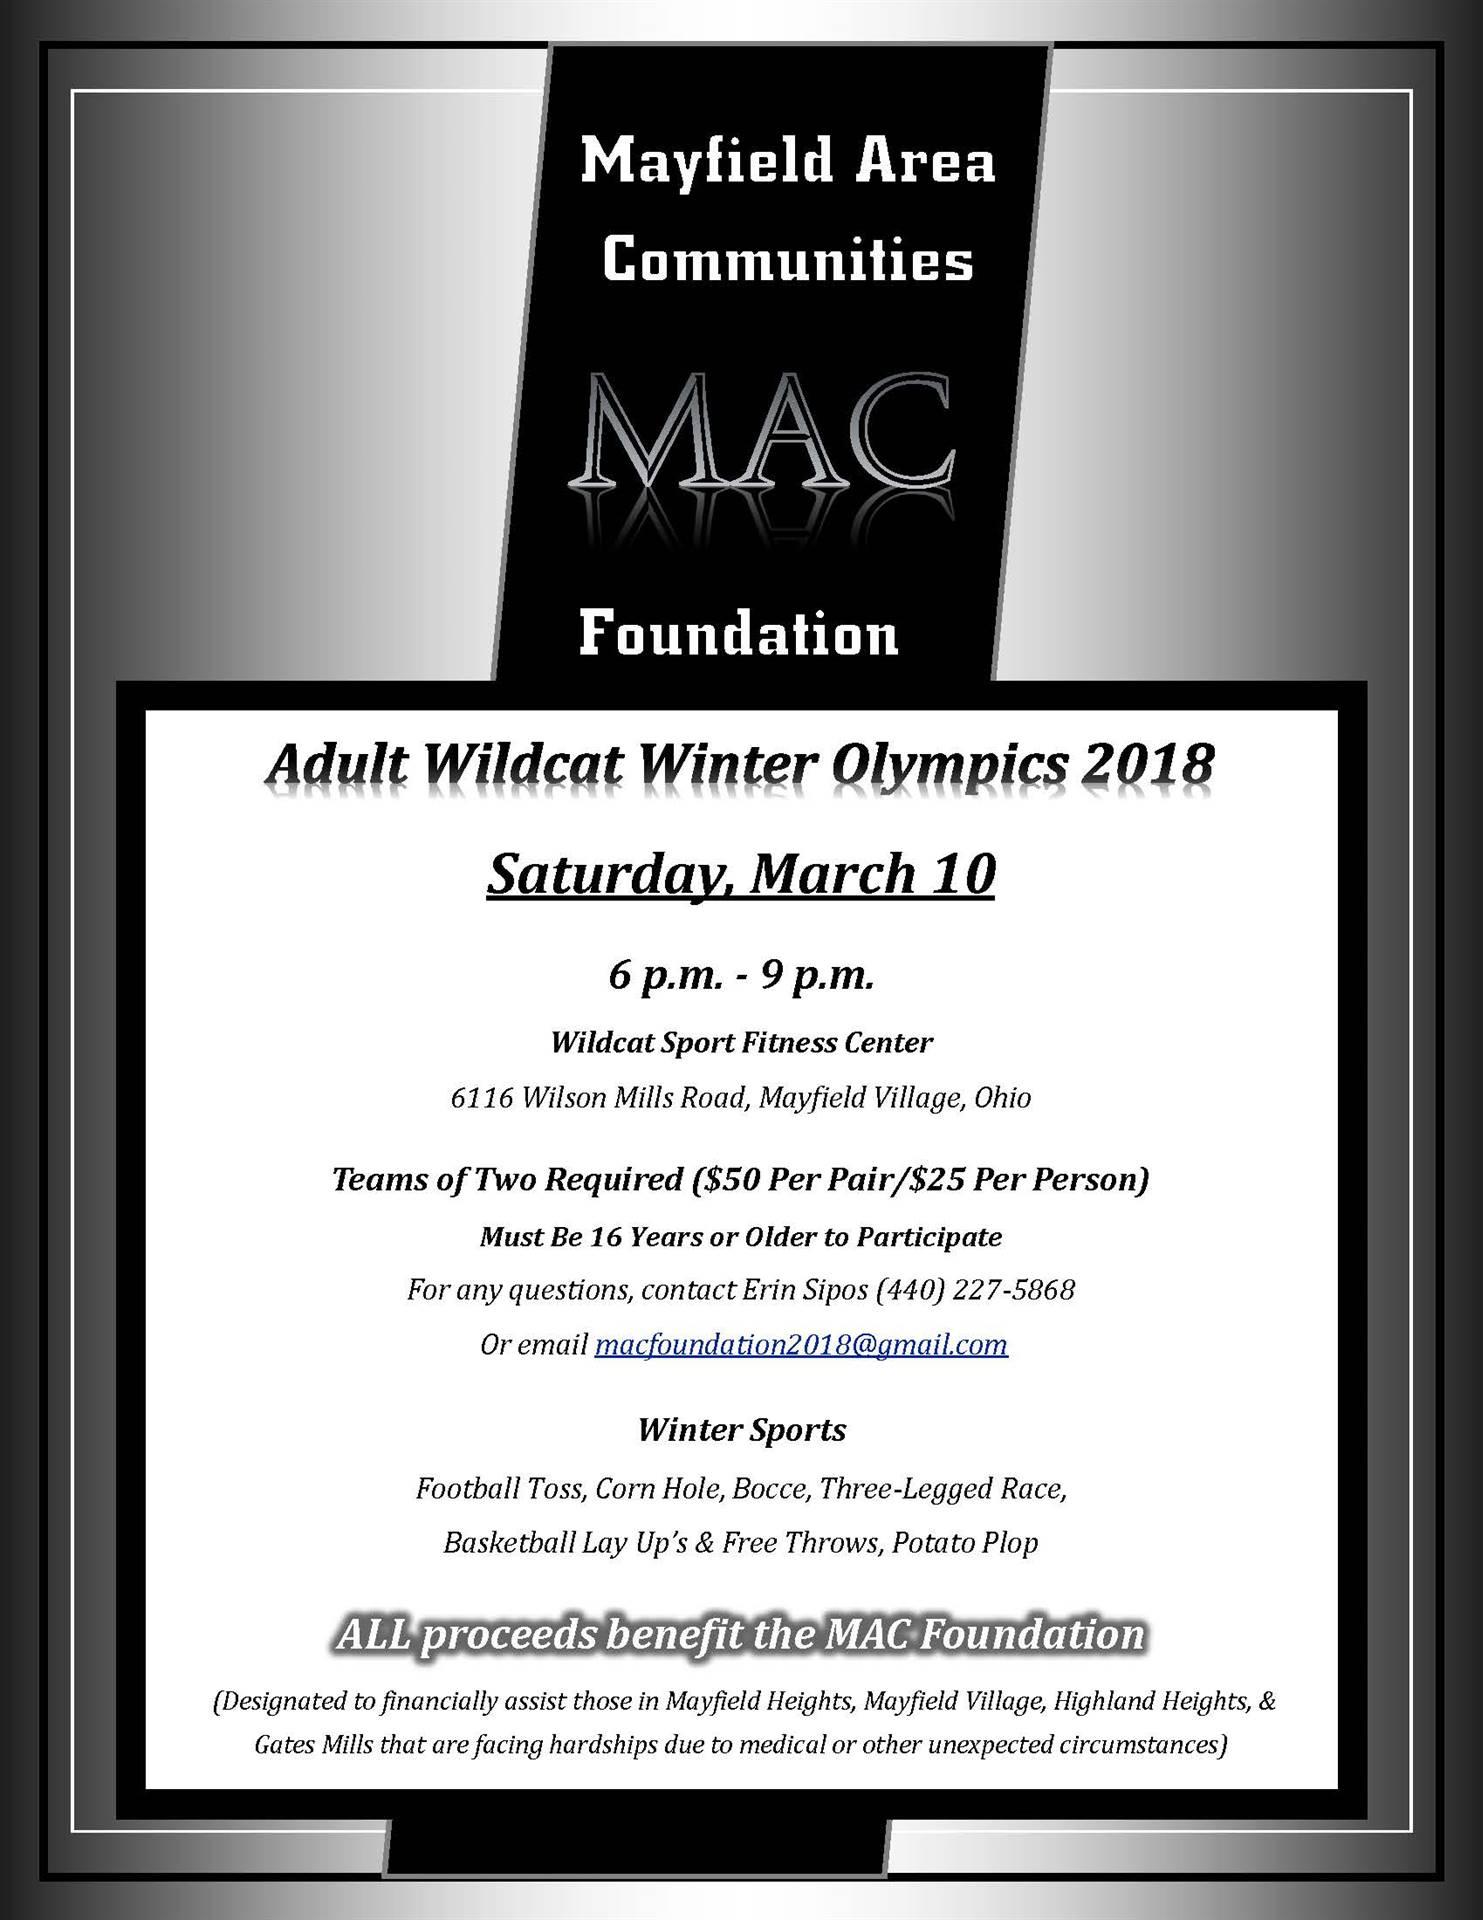 MAc Foundation Winter Olympics